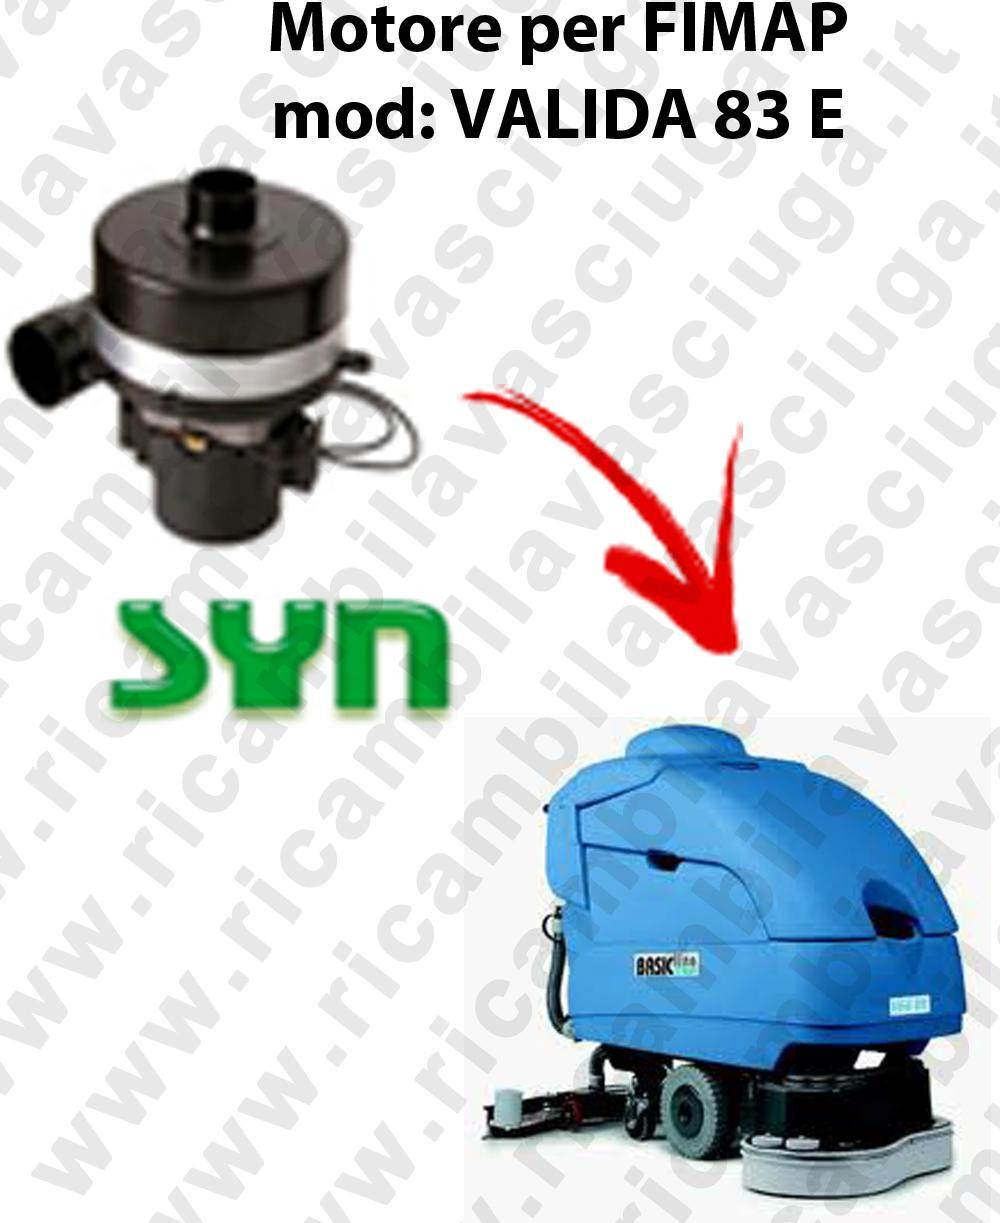 gültig 83 ünd Saugmotor SYNCLEAN für scheuersaugmaschinen FIMAP